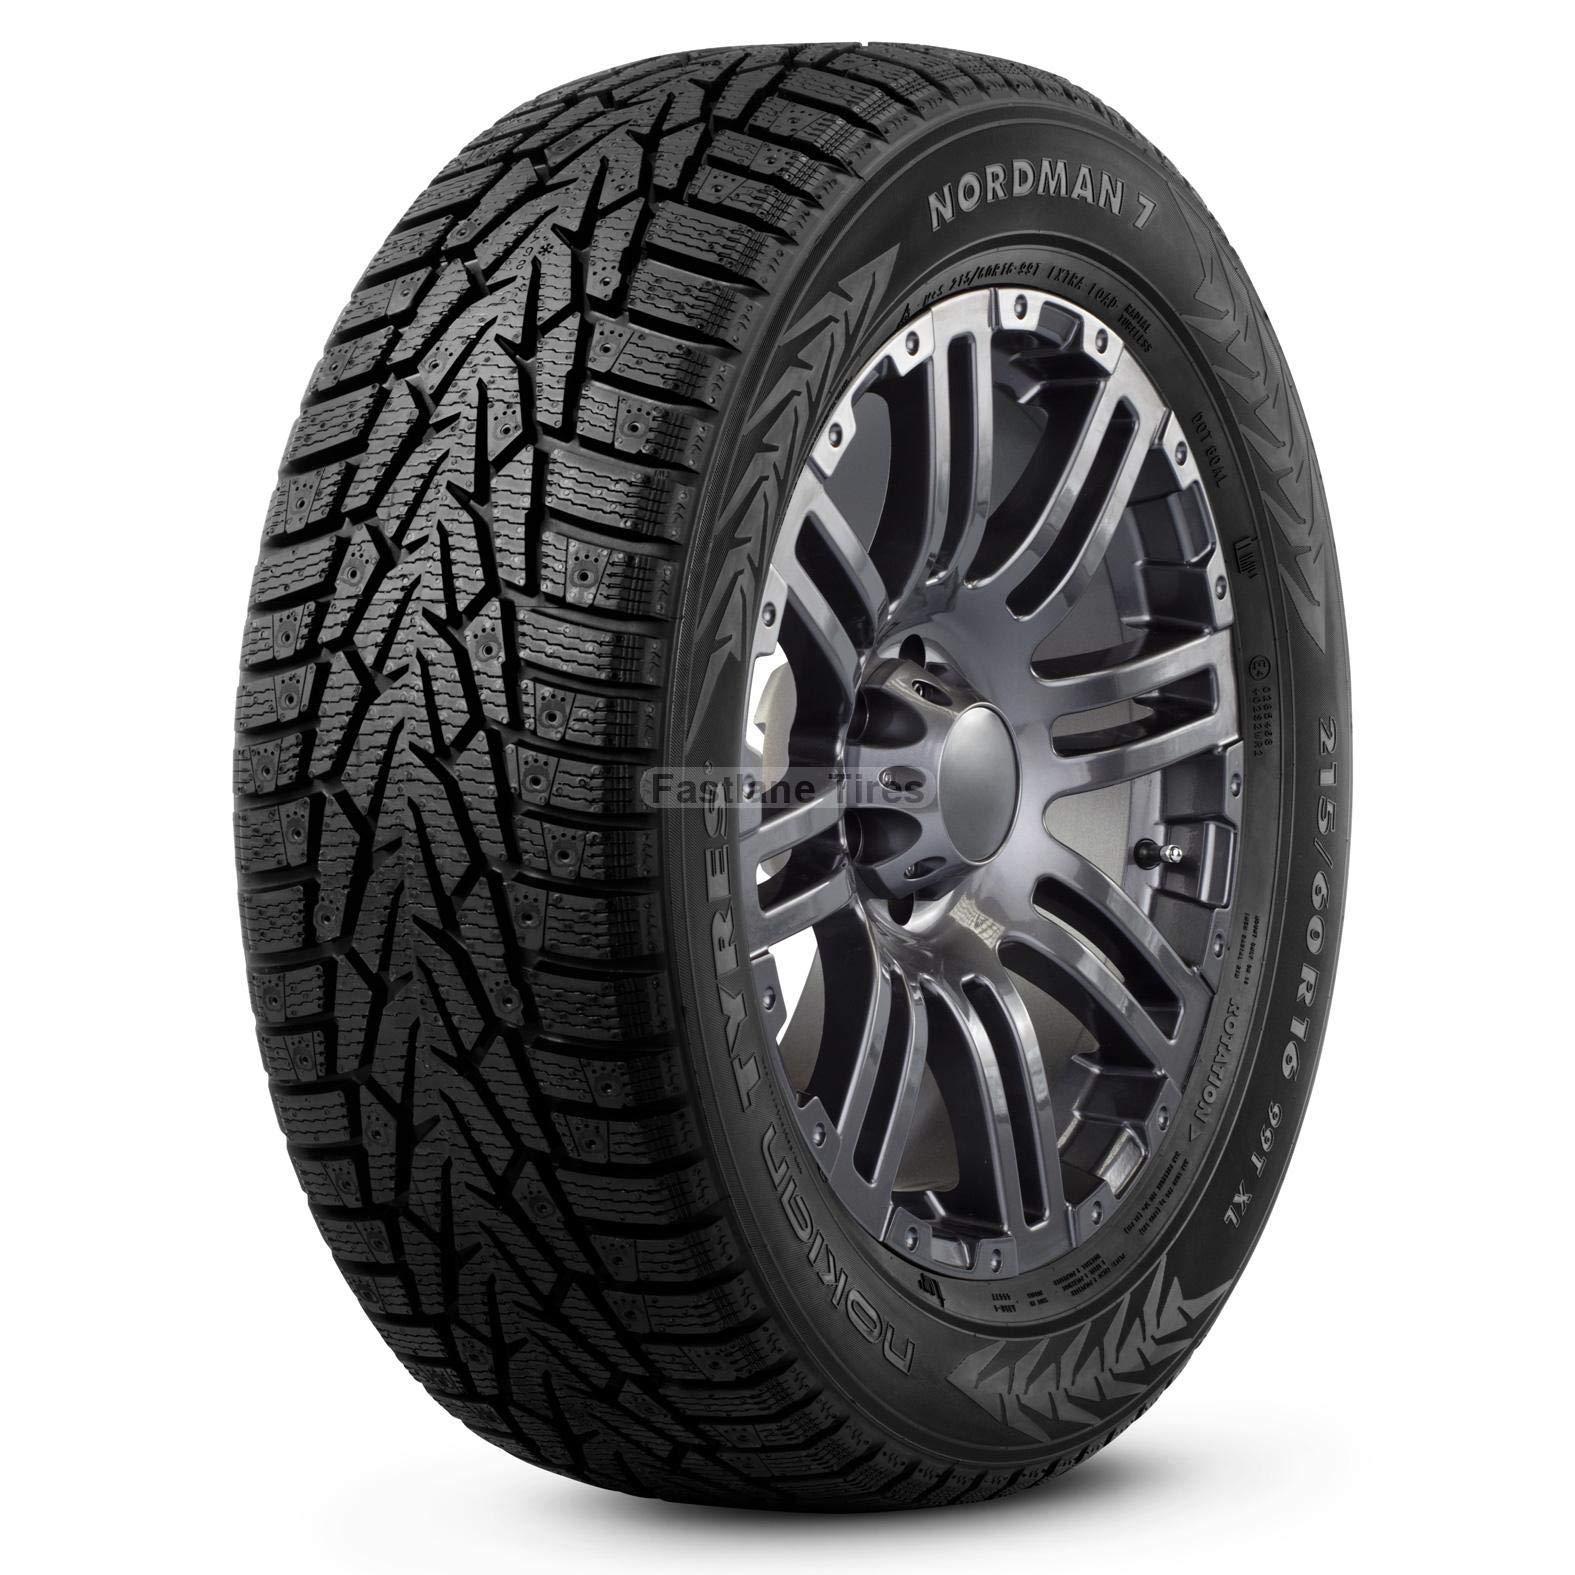 Nokian NORDMAN 7 SUV Performance-Winter Radial Tire-215/70R15 98T